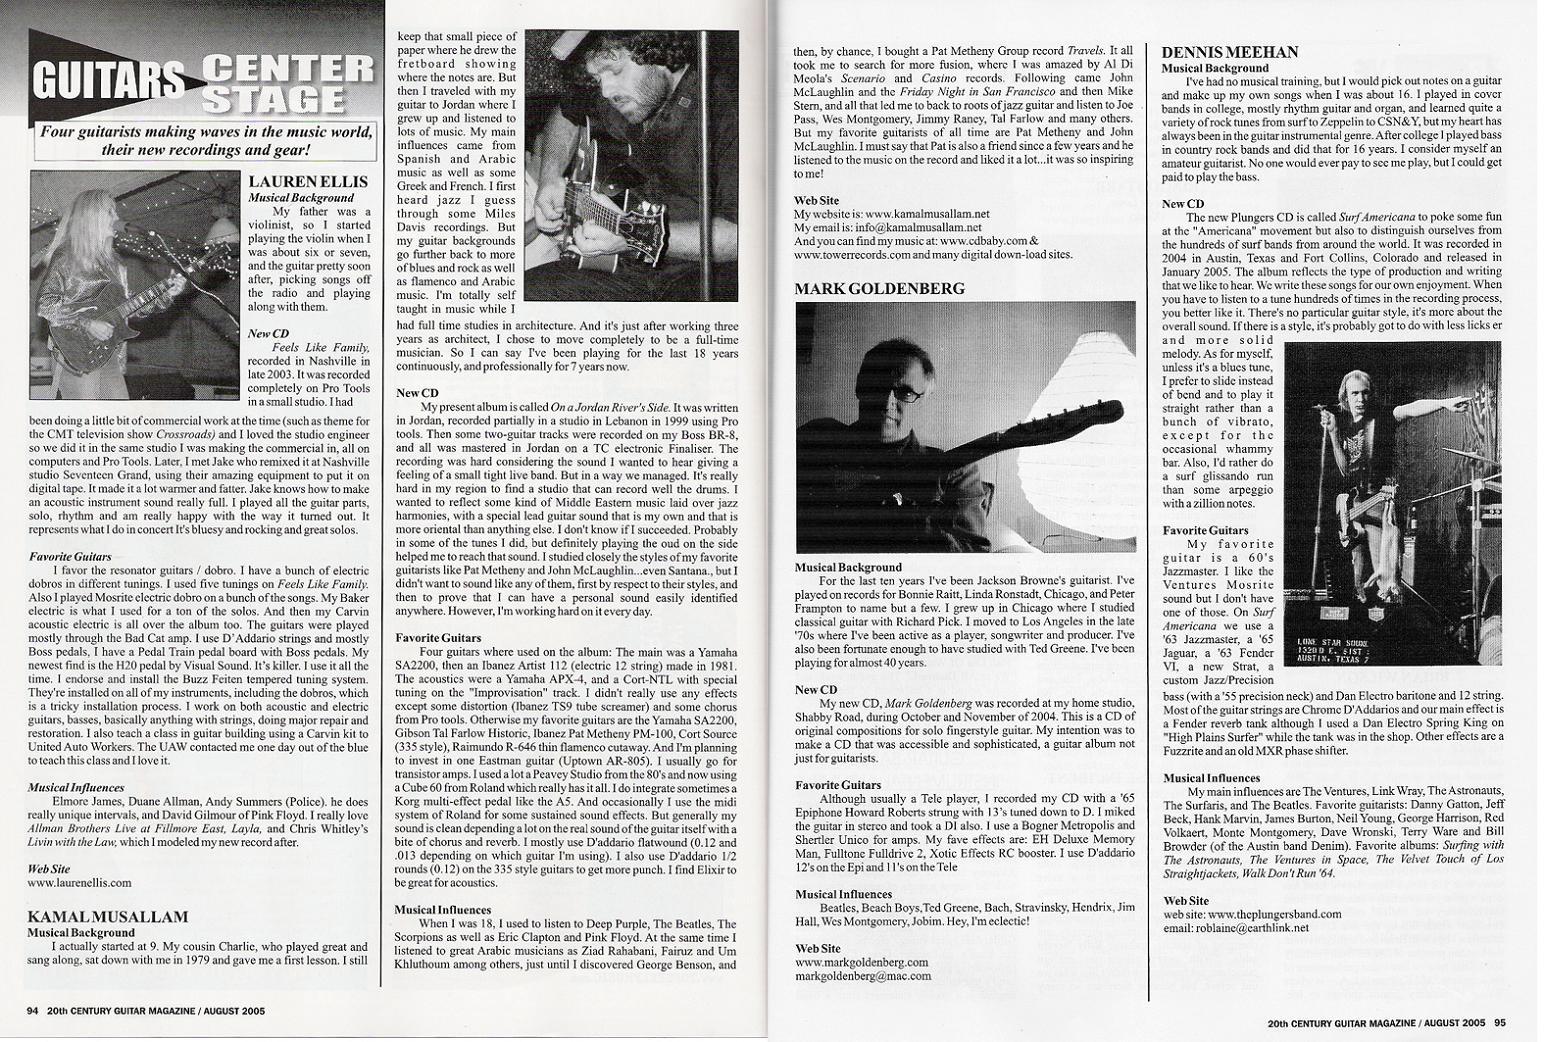 2005.08 - 20th Century Guitar.jpg